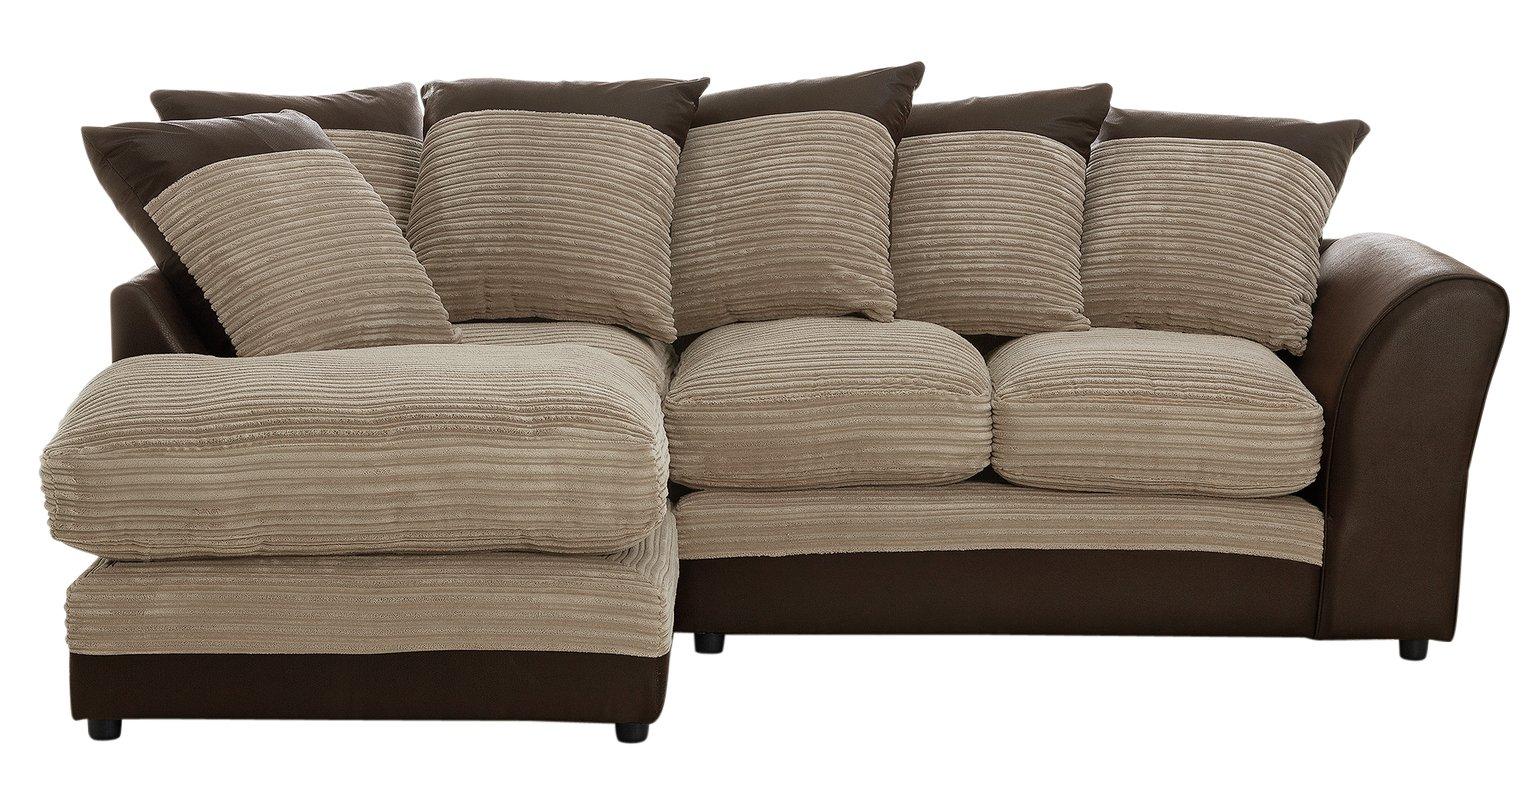 'Home - Harley Regular - Fabric Left Hand Corner Sofa - Natural